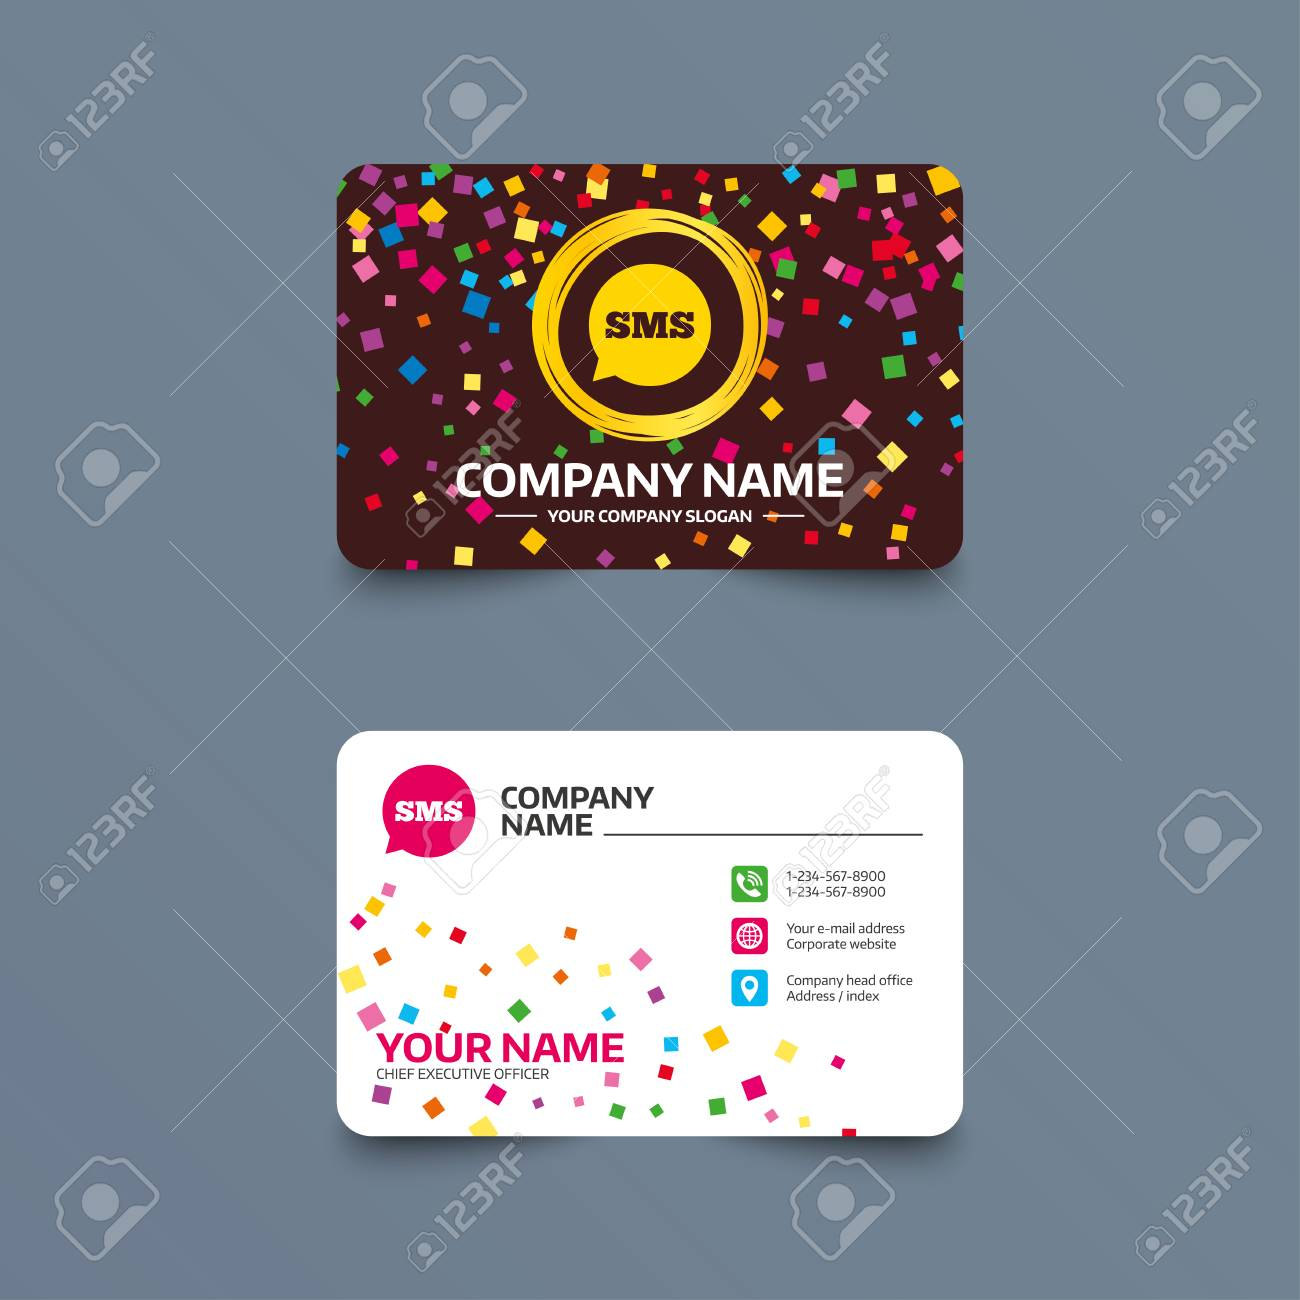 Business card template with confetti pieces sms speech bubble business card template with confetti pieces sms speech bubble icon information message symbol colourmoves